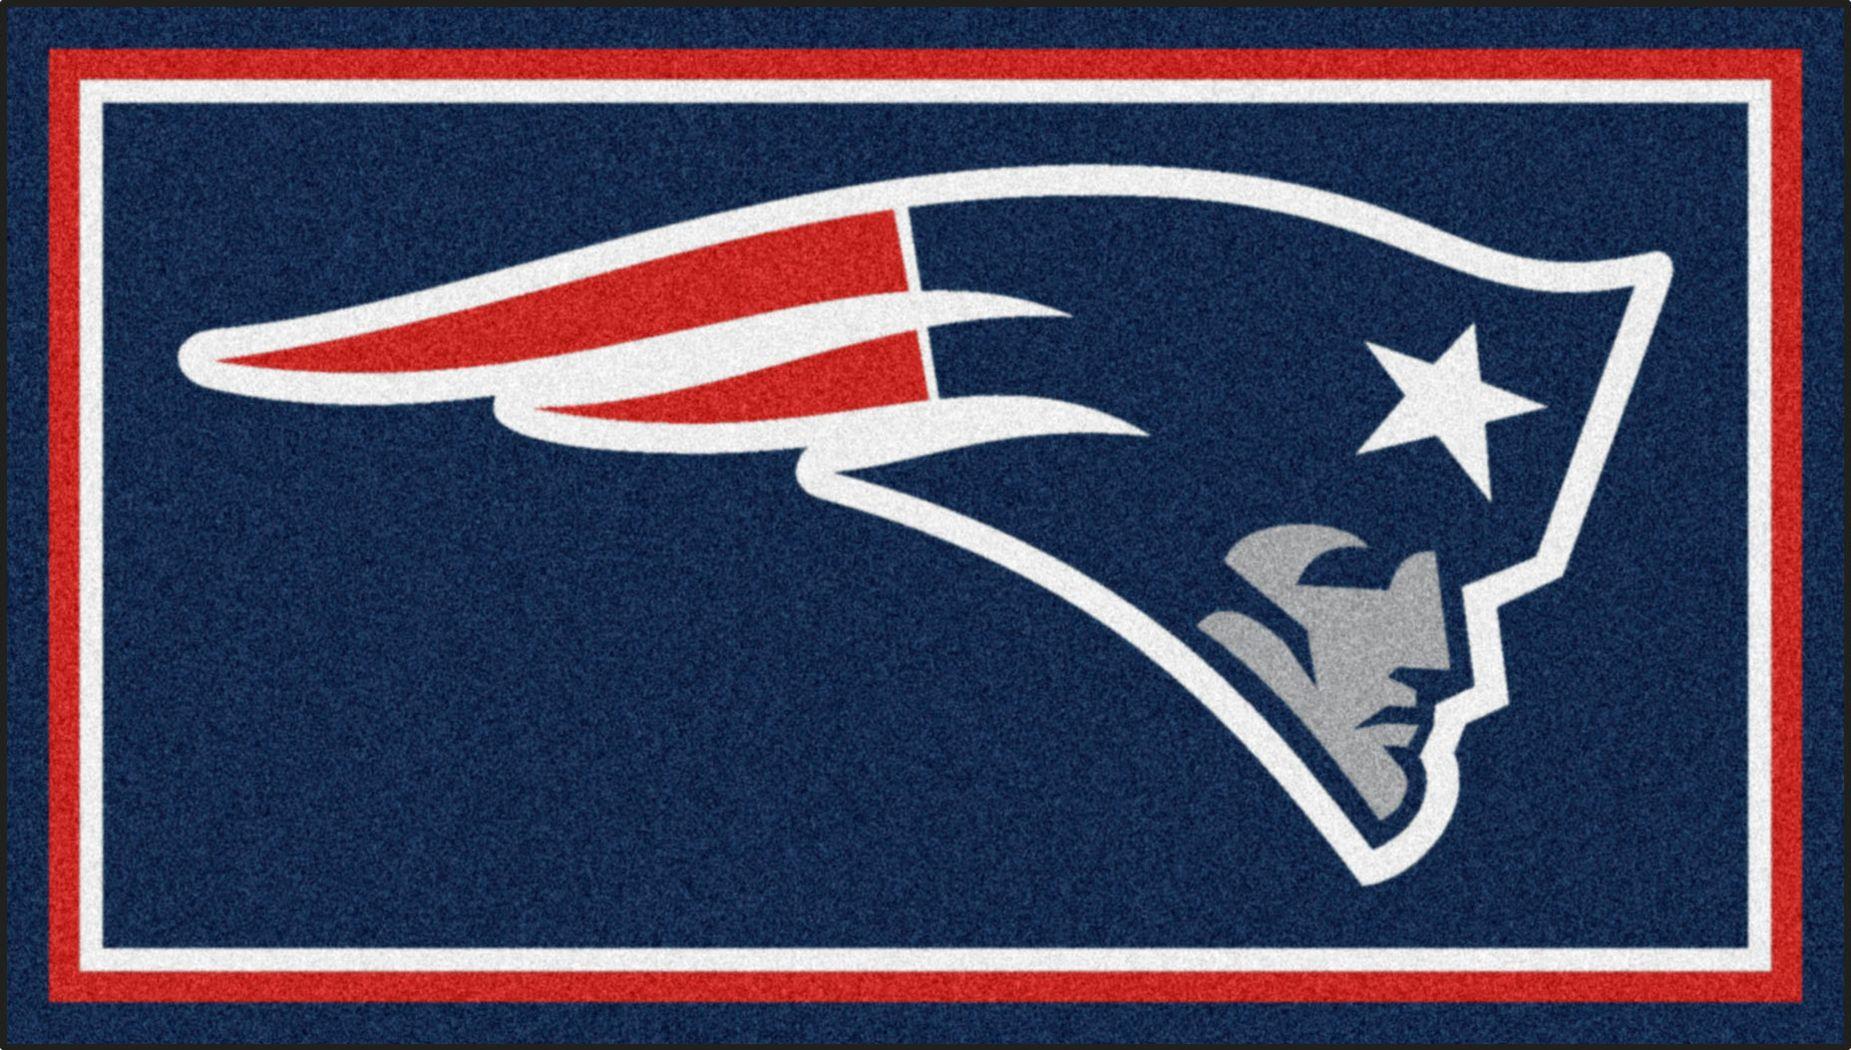 NFL Big Game New England Patriots 3' x 5' Rug